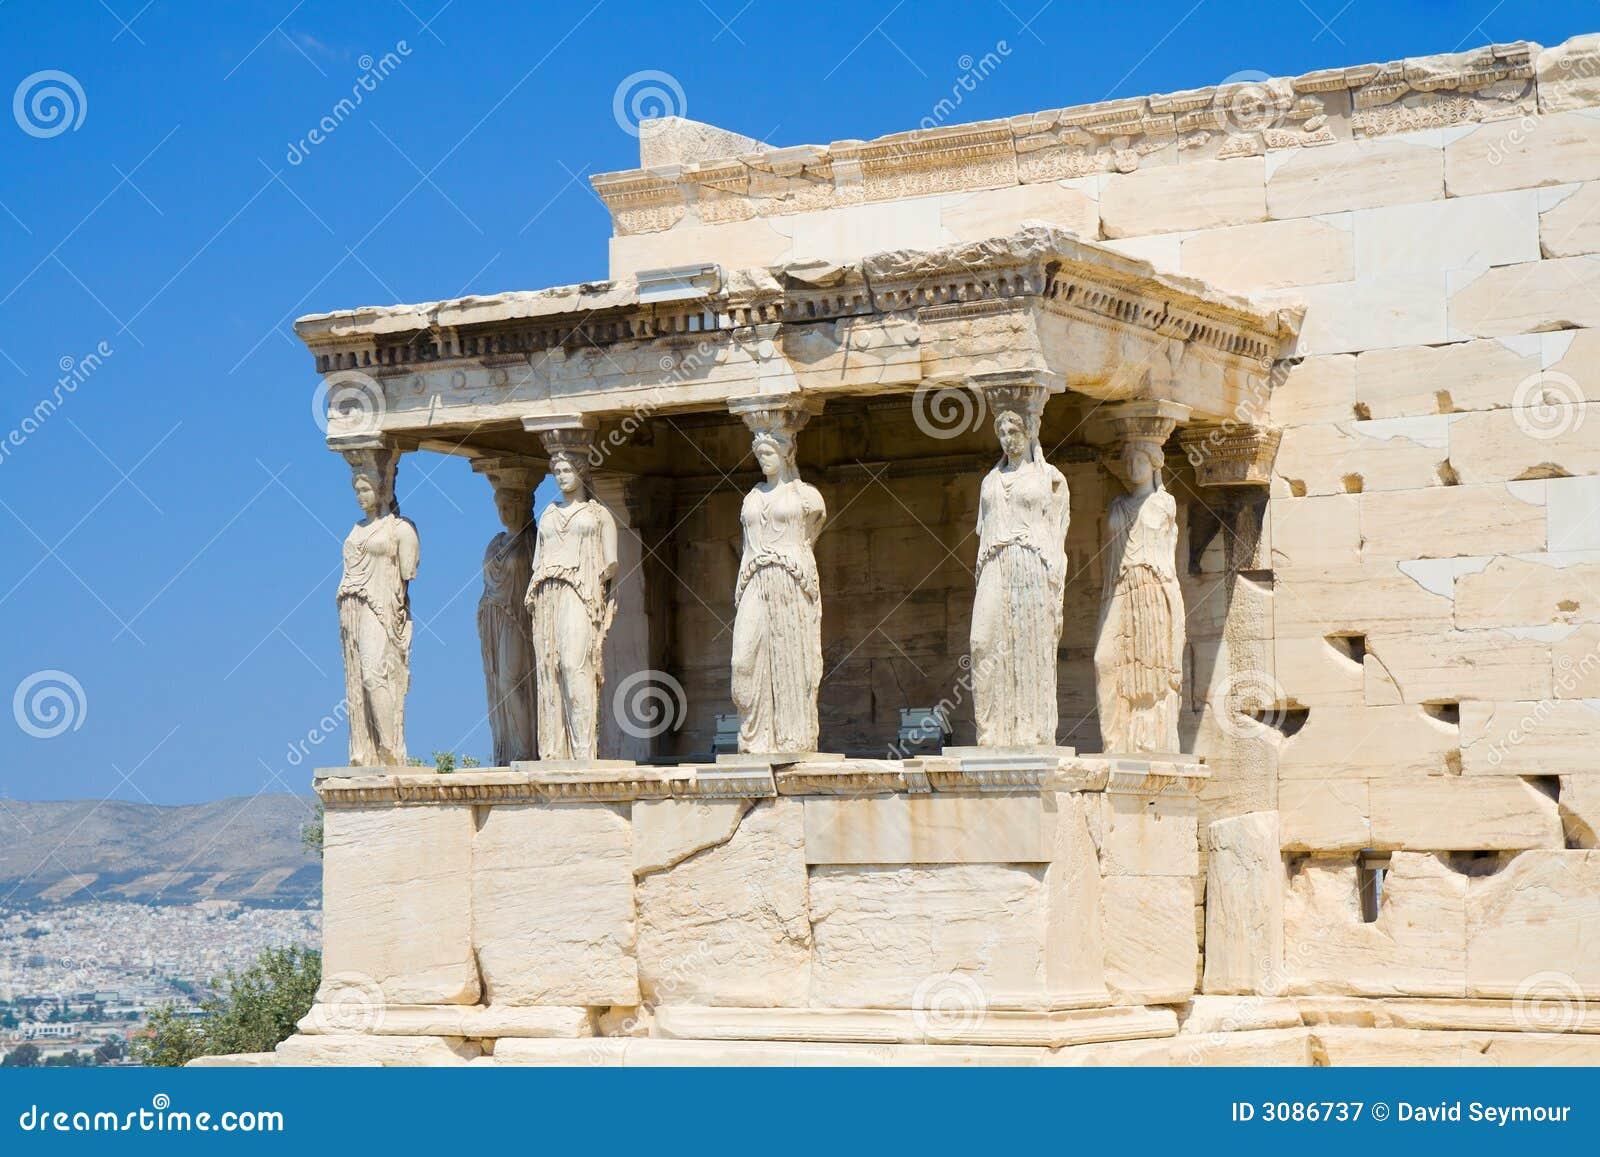 Athens caryatids